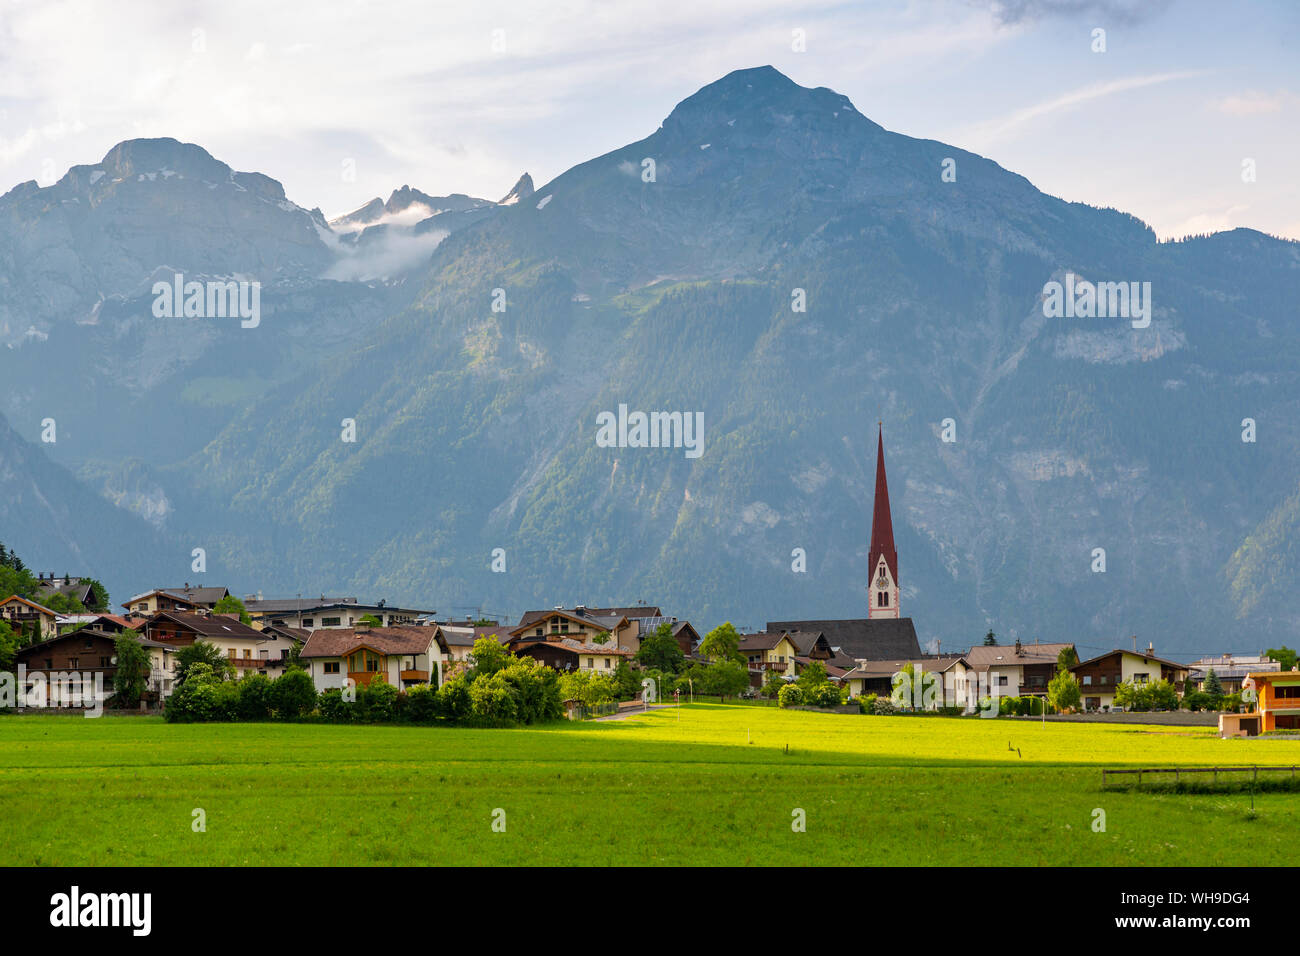 View of village Church in the Tuxertal valley, Mayrhofen, Zillertal Valley, Tyrol, Austria, Europe Stock Photo